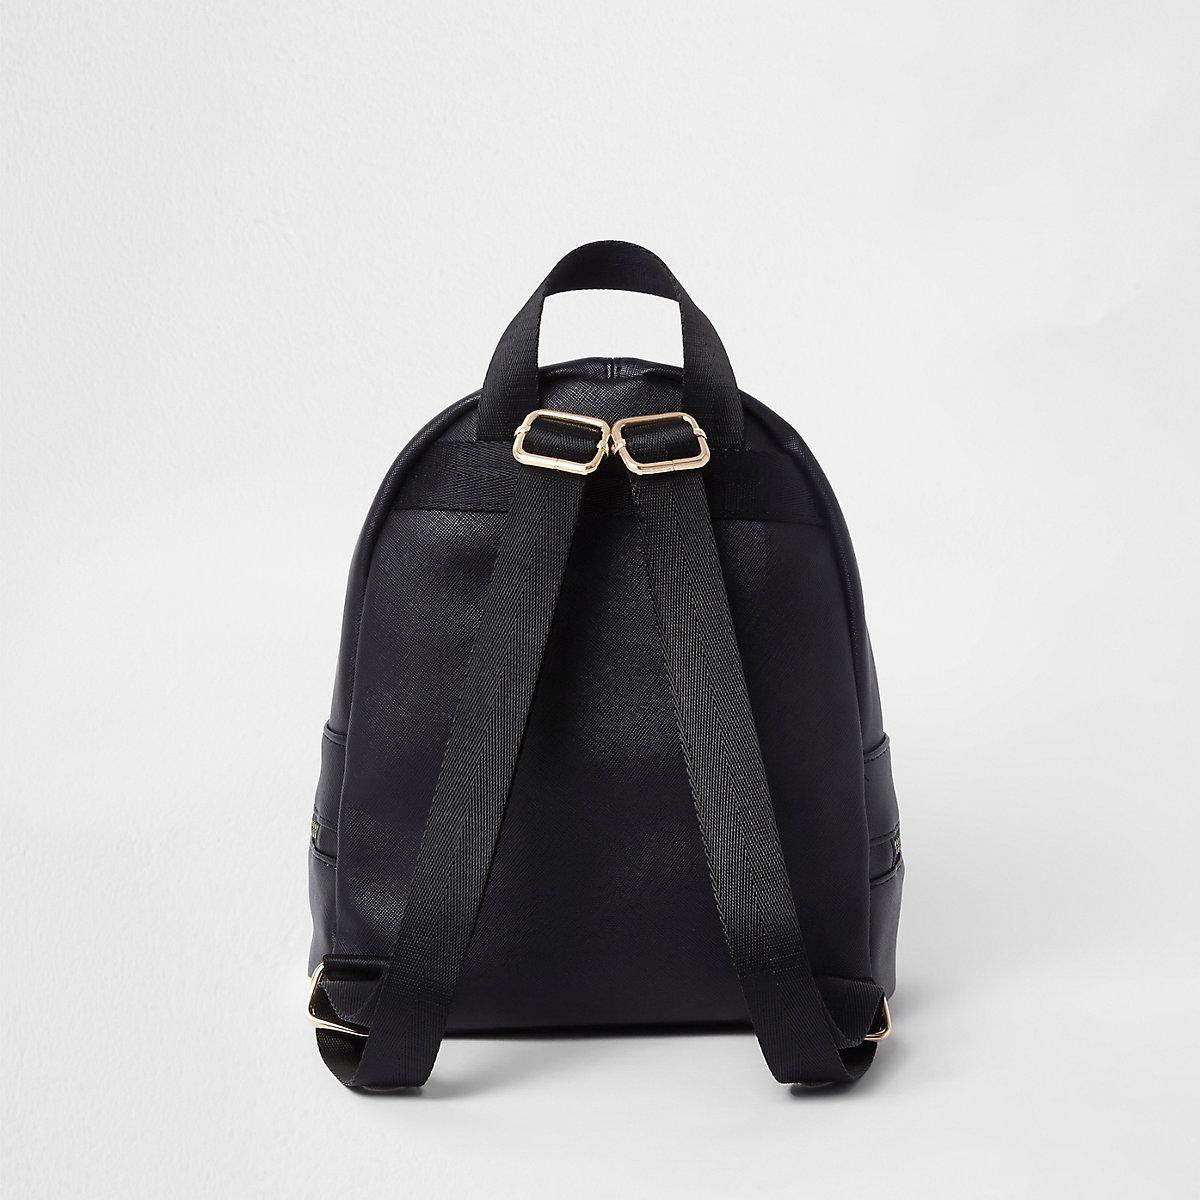 05b2e9ae76 Girls black floral print zip around backpack - Backpacks - Bags   Purses -  girls